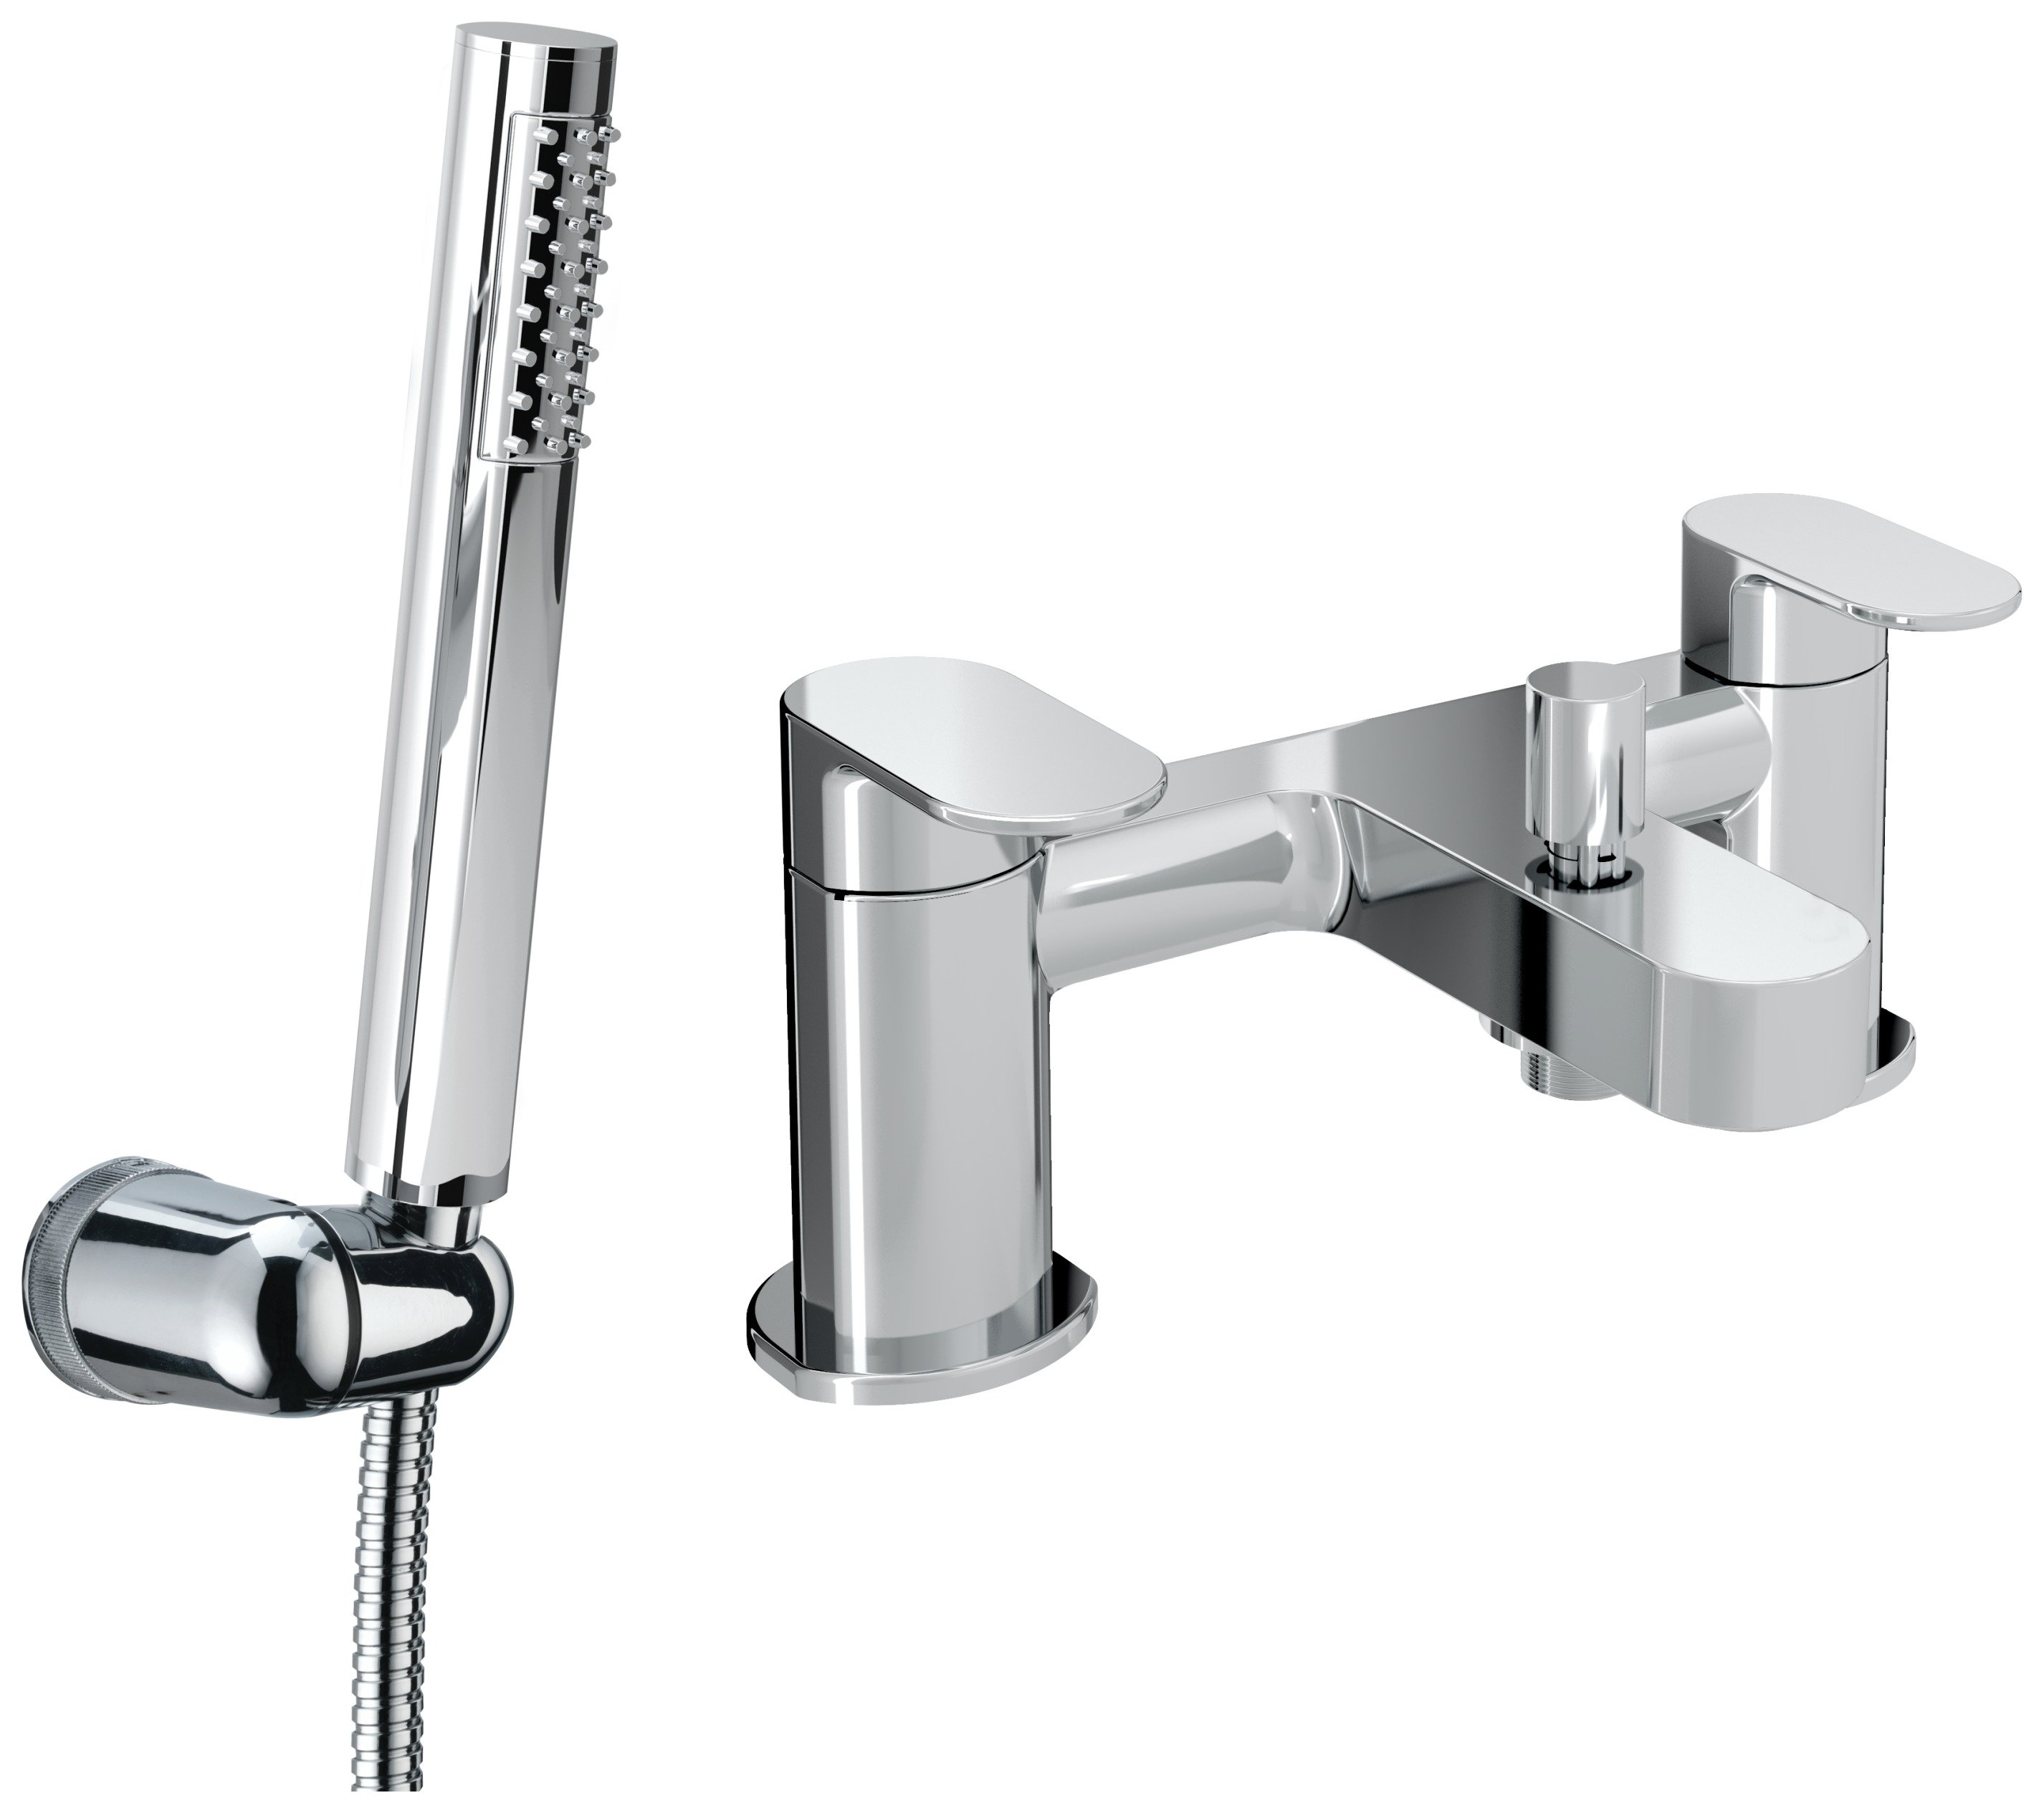 Bristan Frenzy Bath and Shower Mixer.